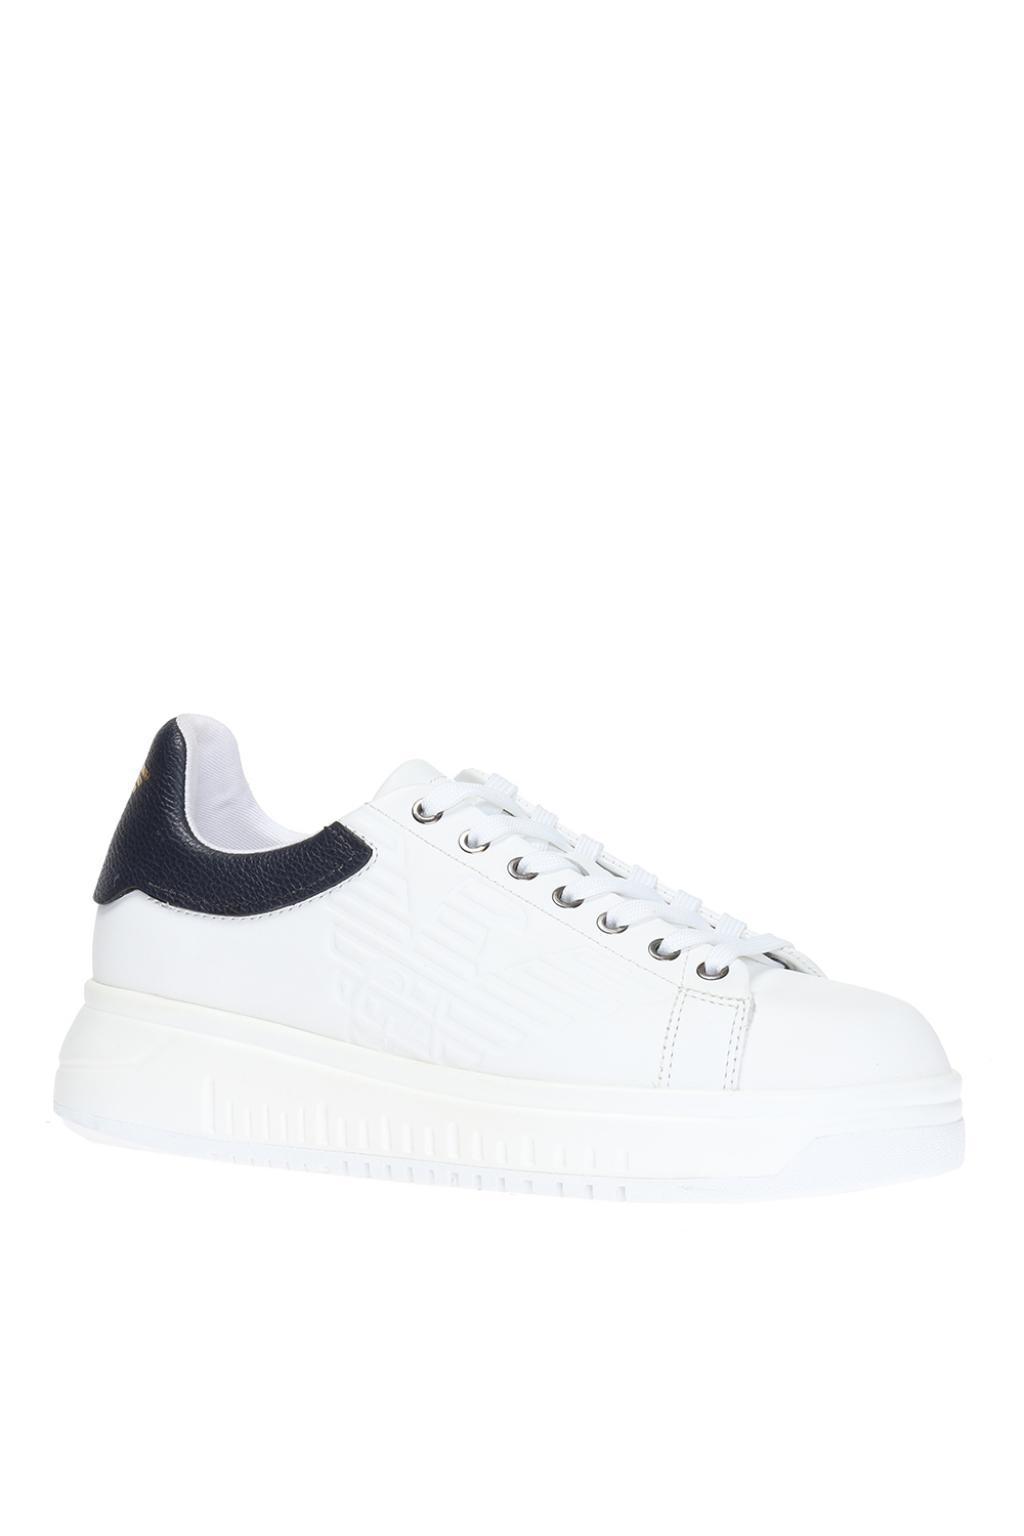 platform runner sneakers - White Emporio Armani xt3ff8